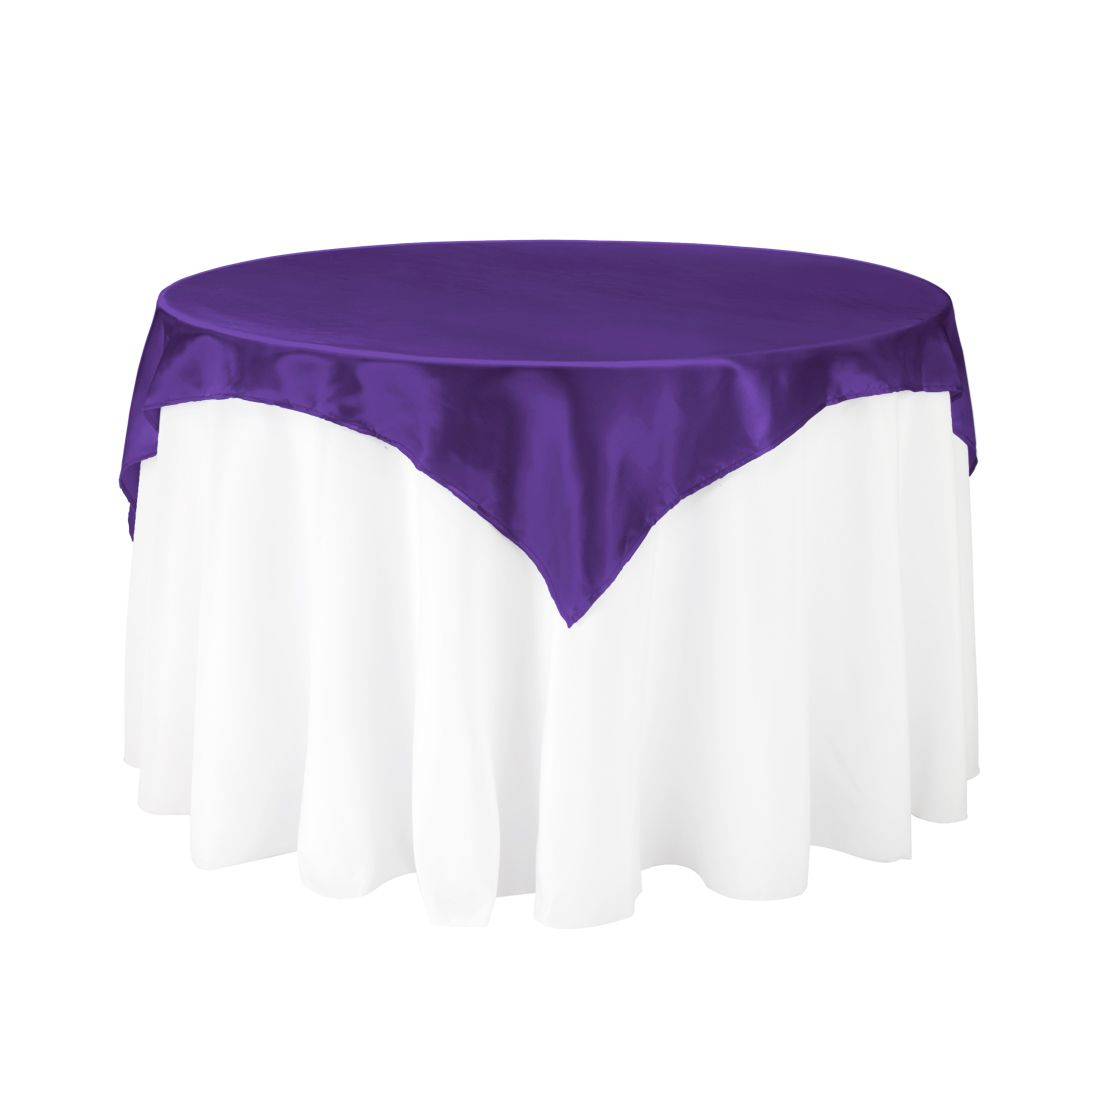 Square Satin Overlay Purple